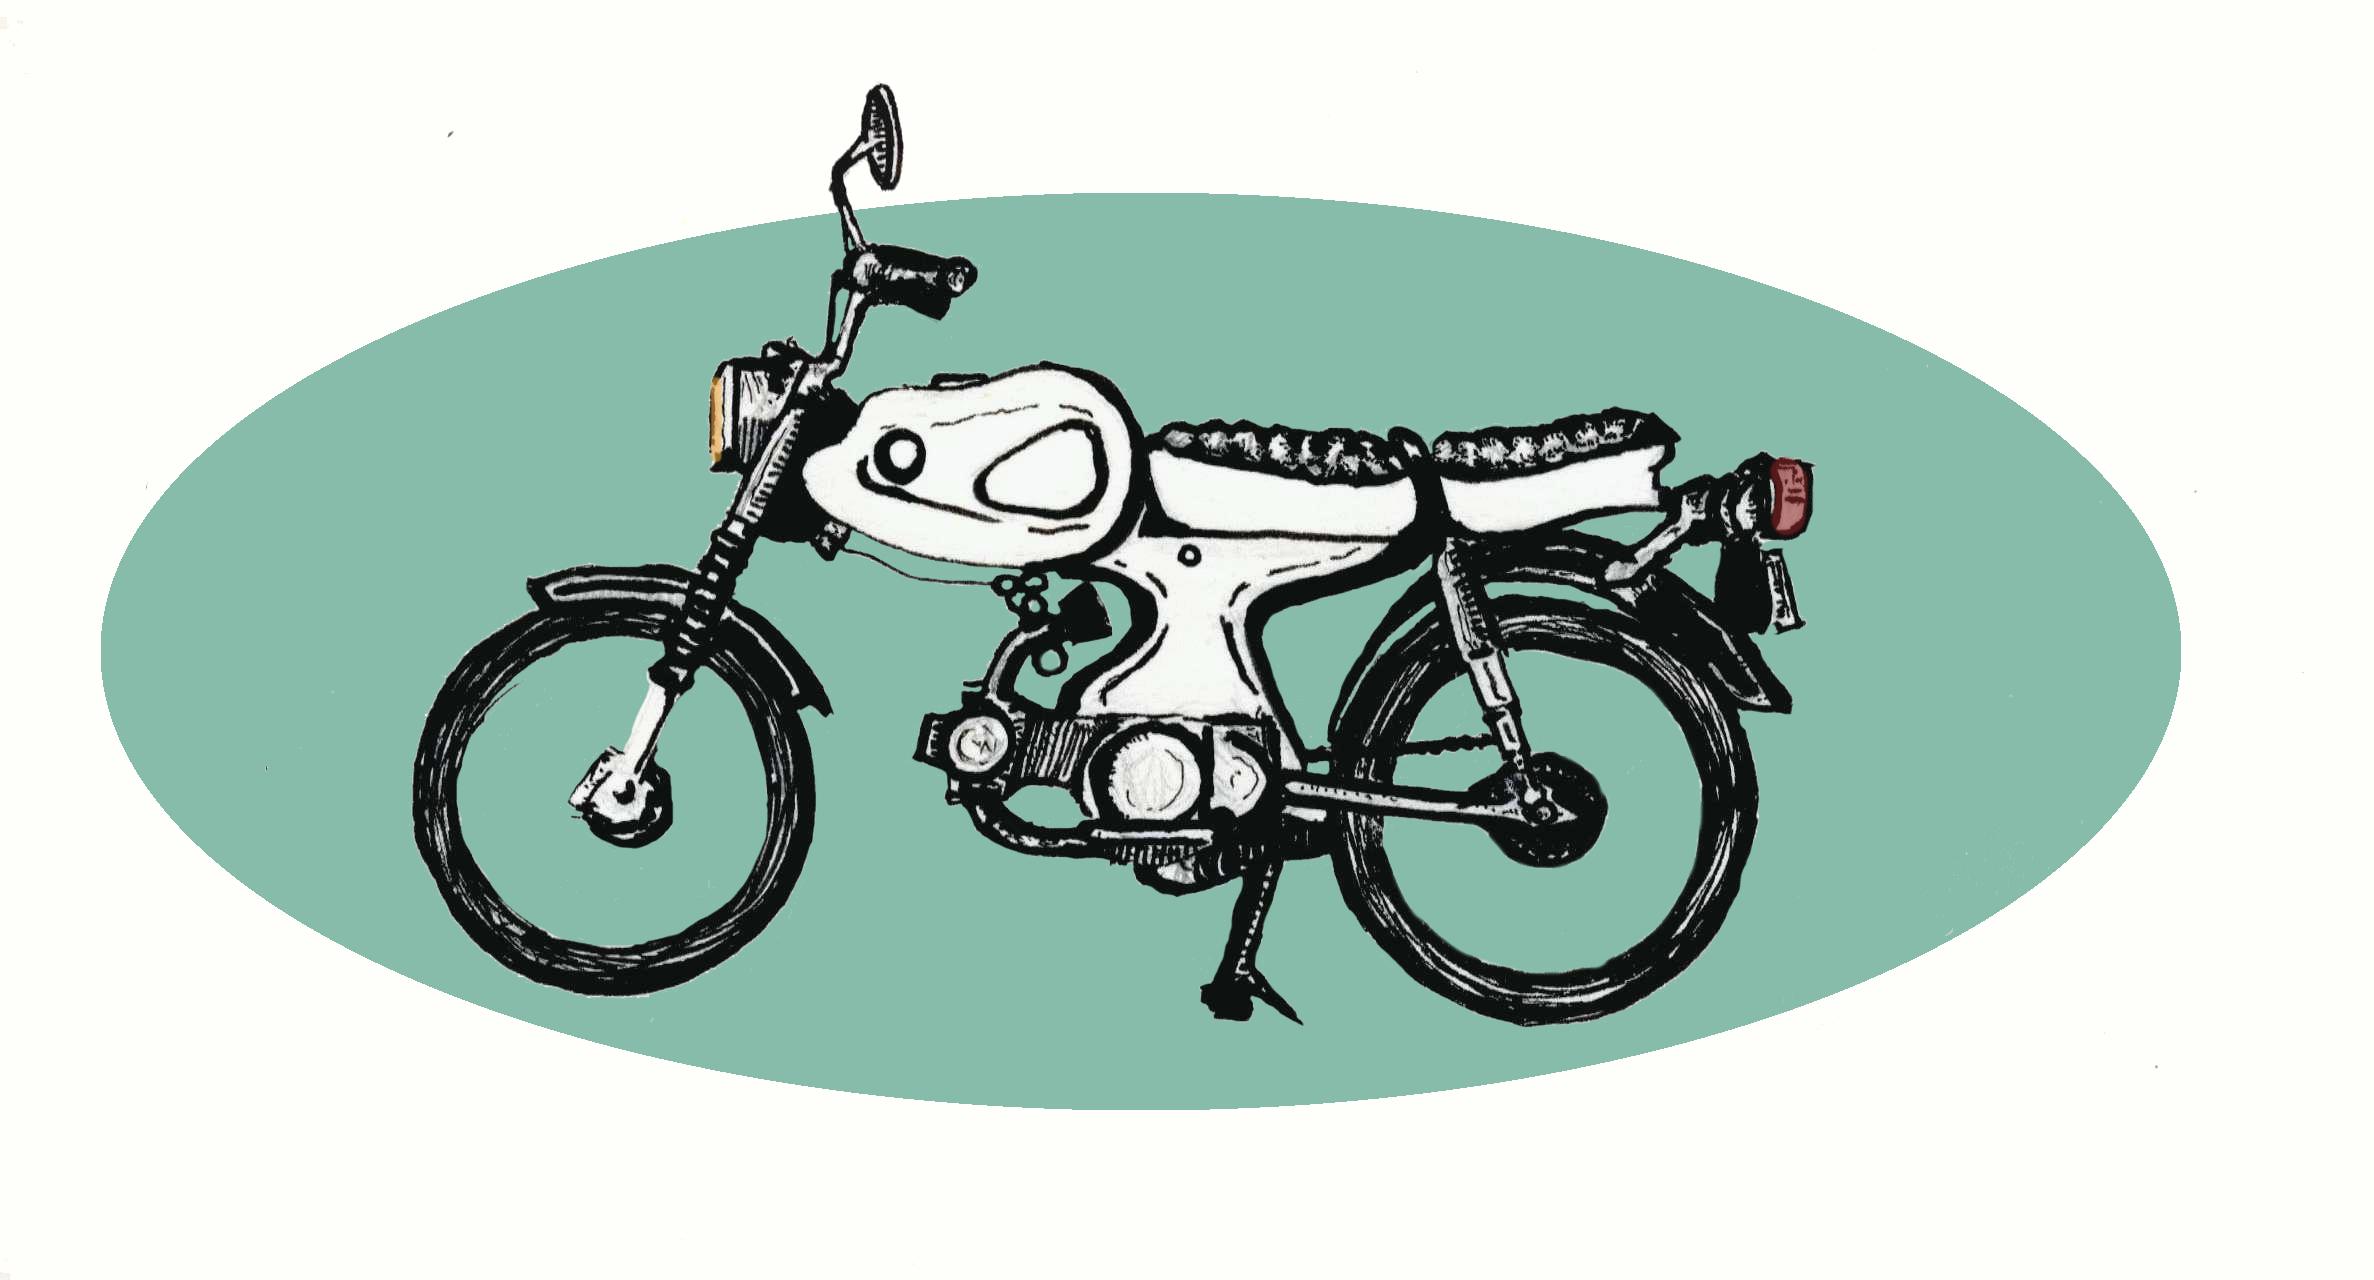 """Ride""  //  for DIY bodyshop concept  //  ink and digital color  //  2016"